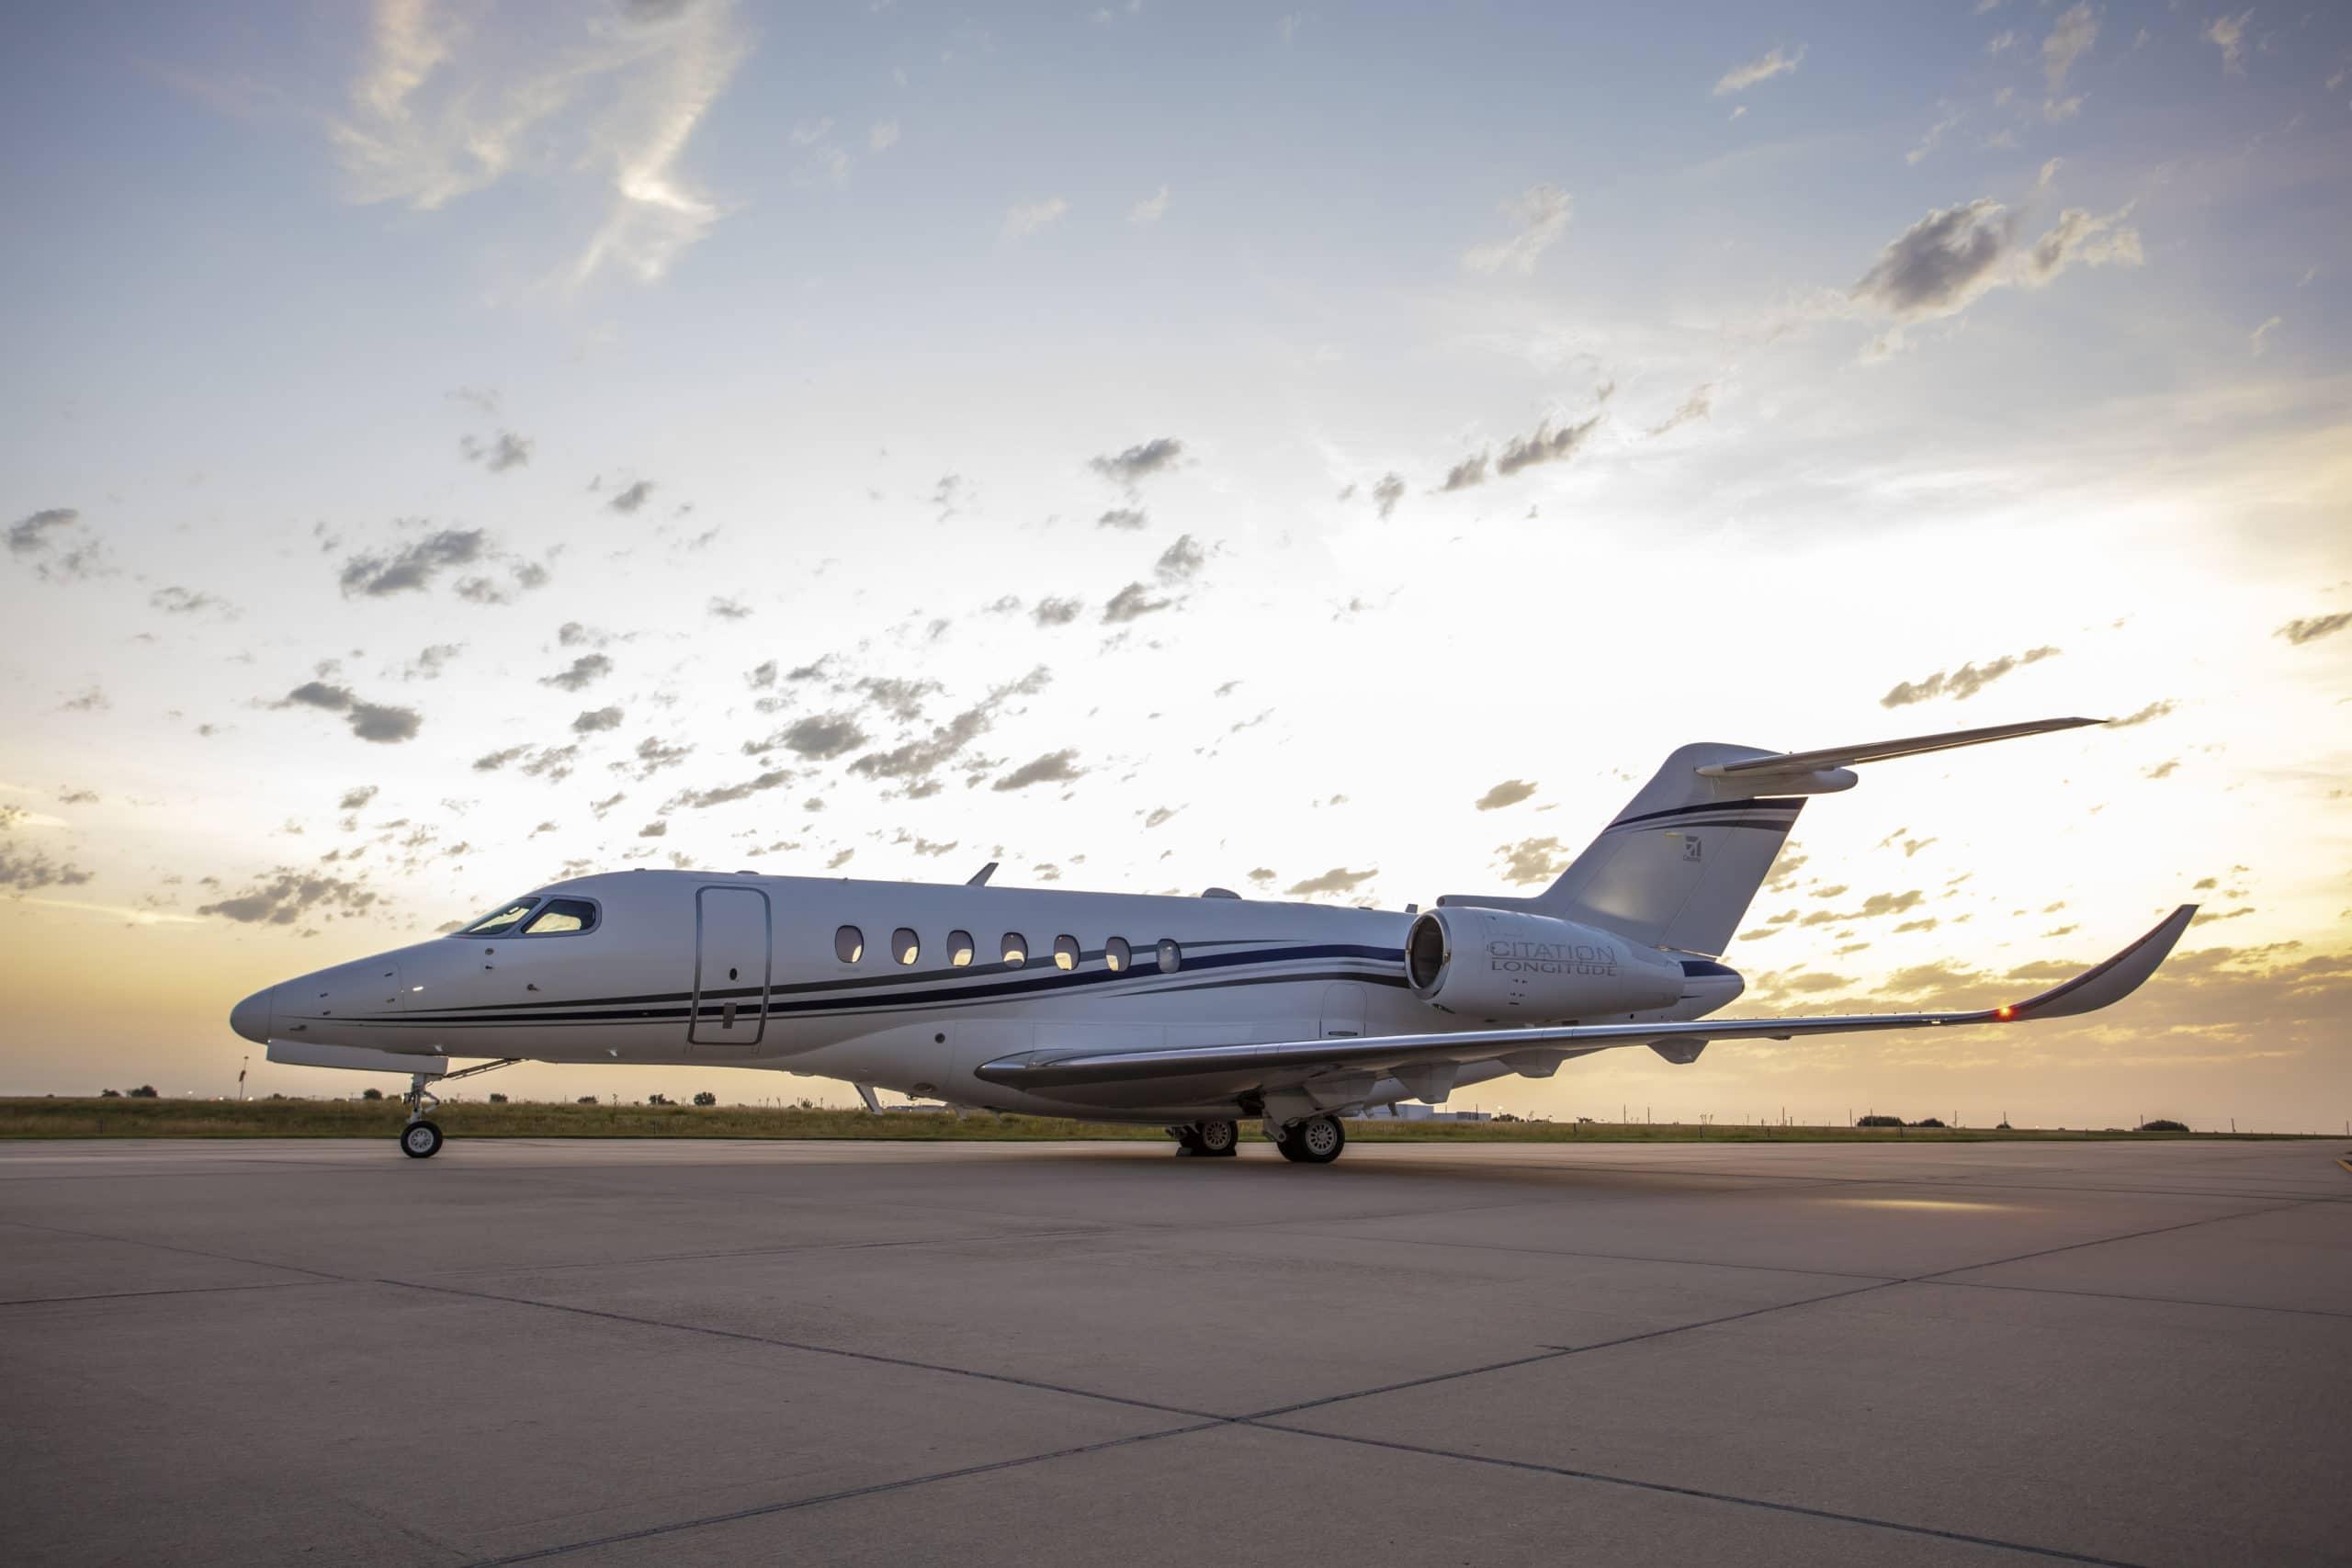 Citation Longitude Private Jet Hire